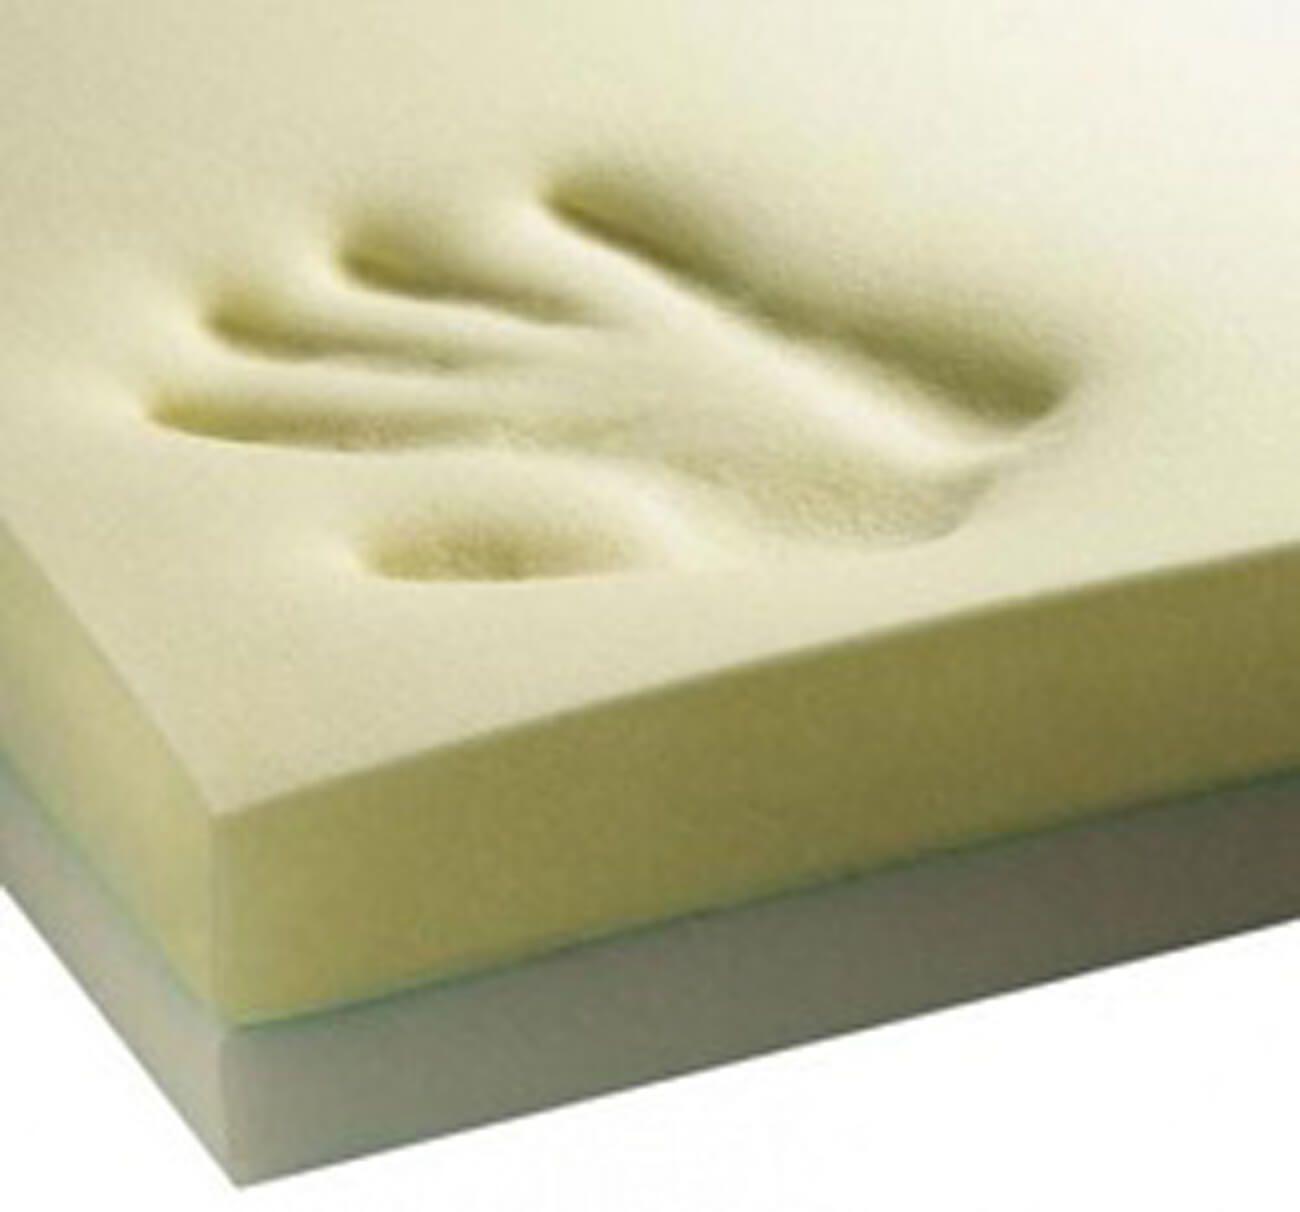 Pilow Top Visco Elastico King Size 1,93x2,03x5,0cm  - Kenko Premium Colchões